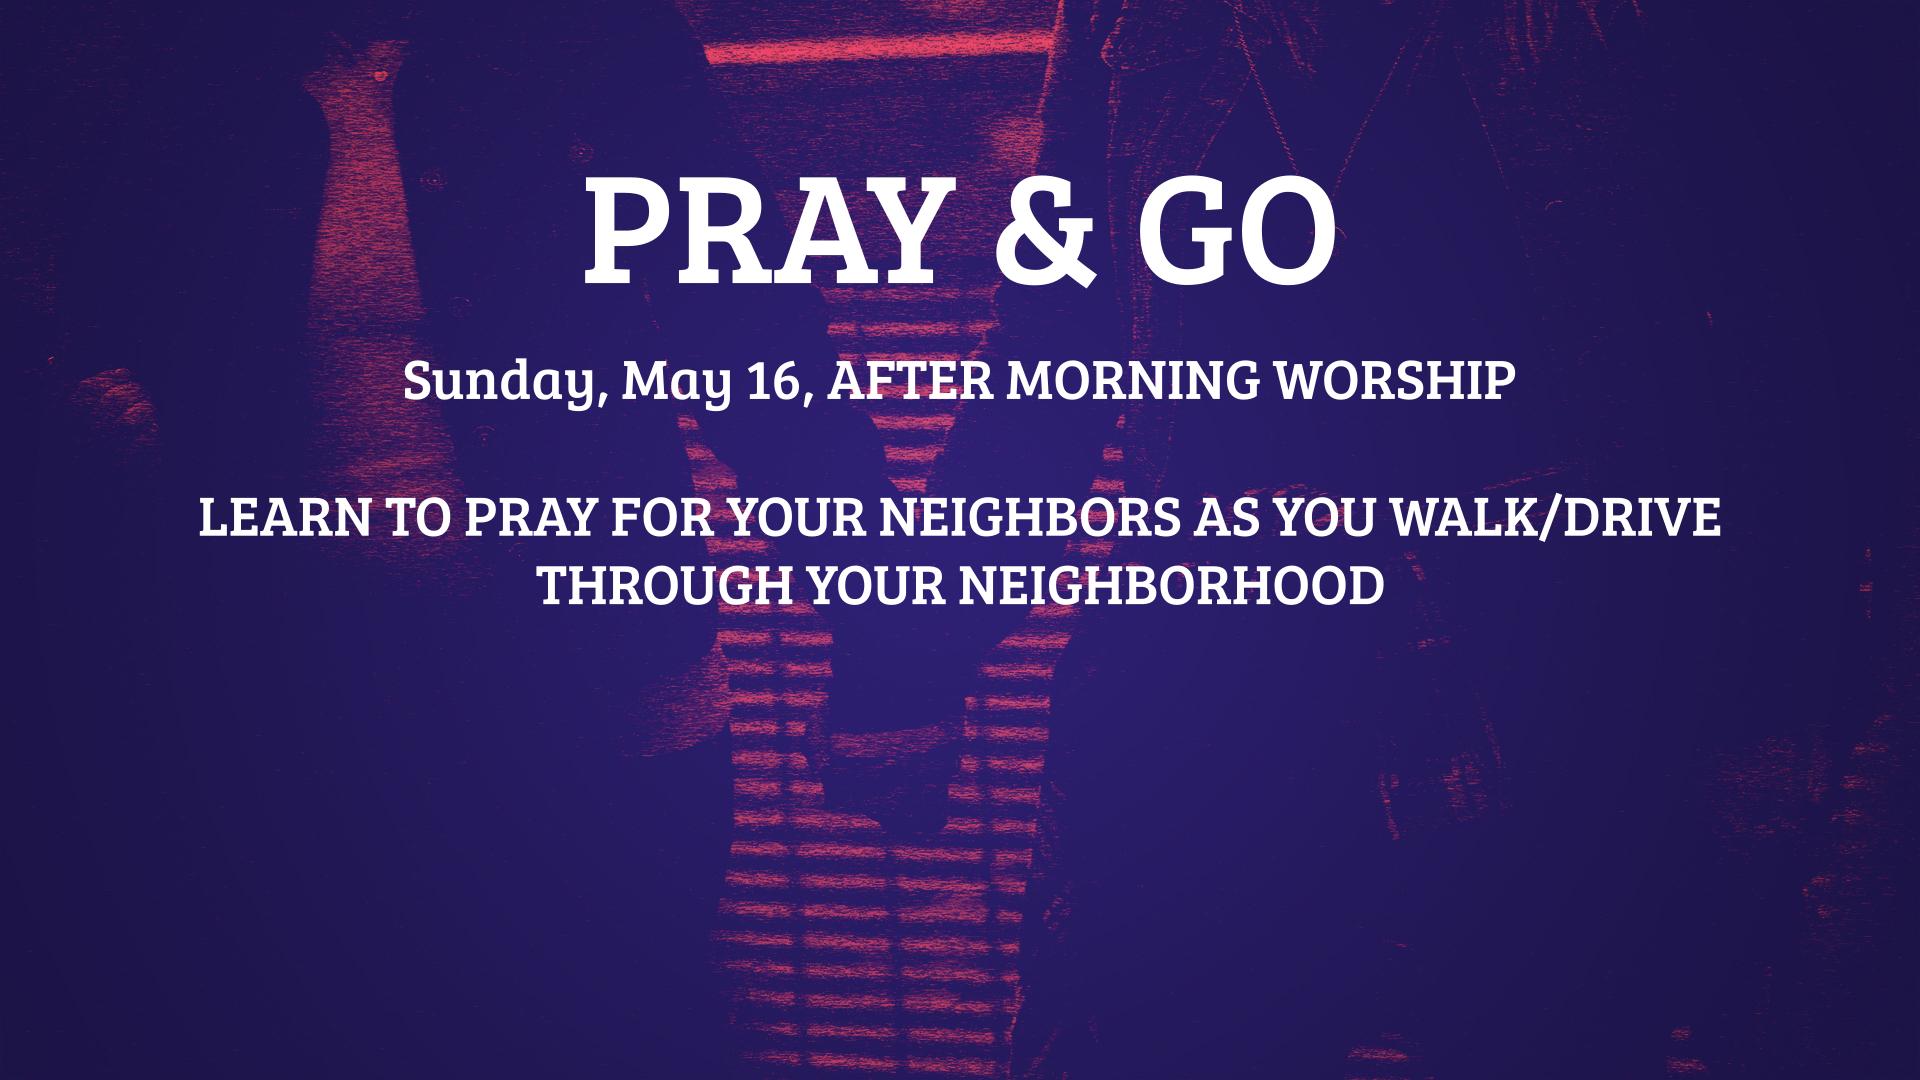 PRAY & GO